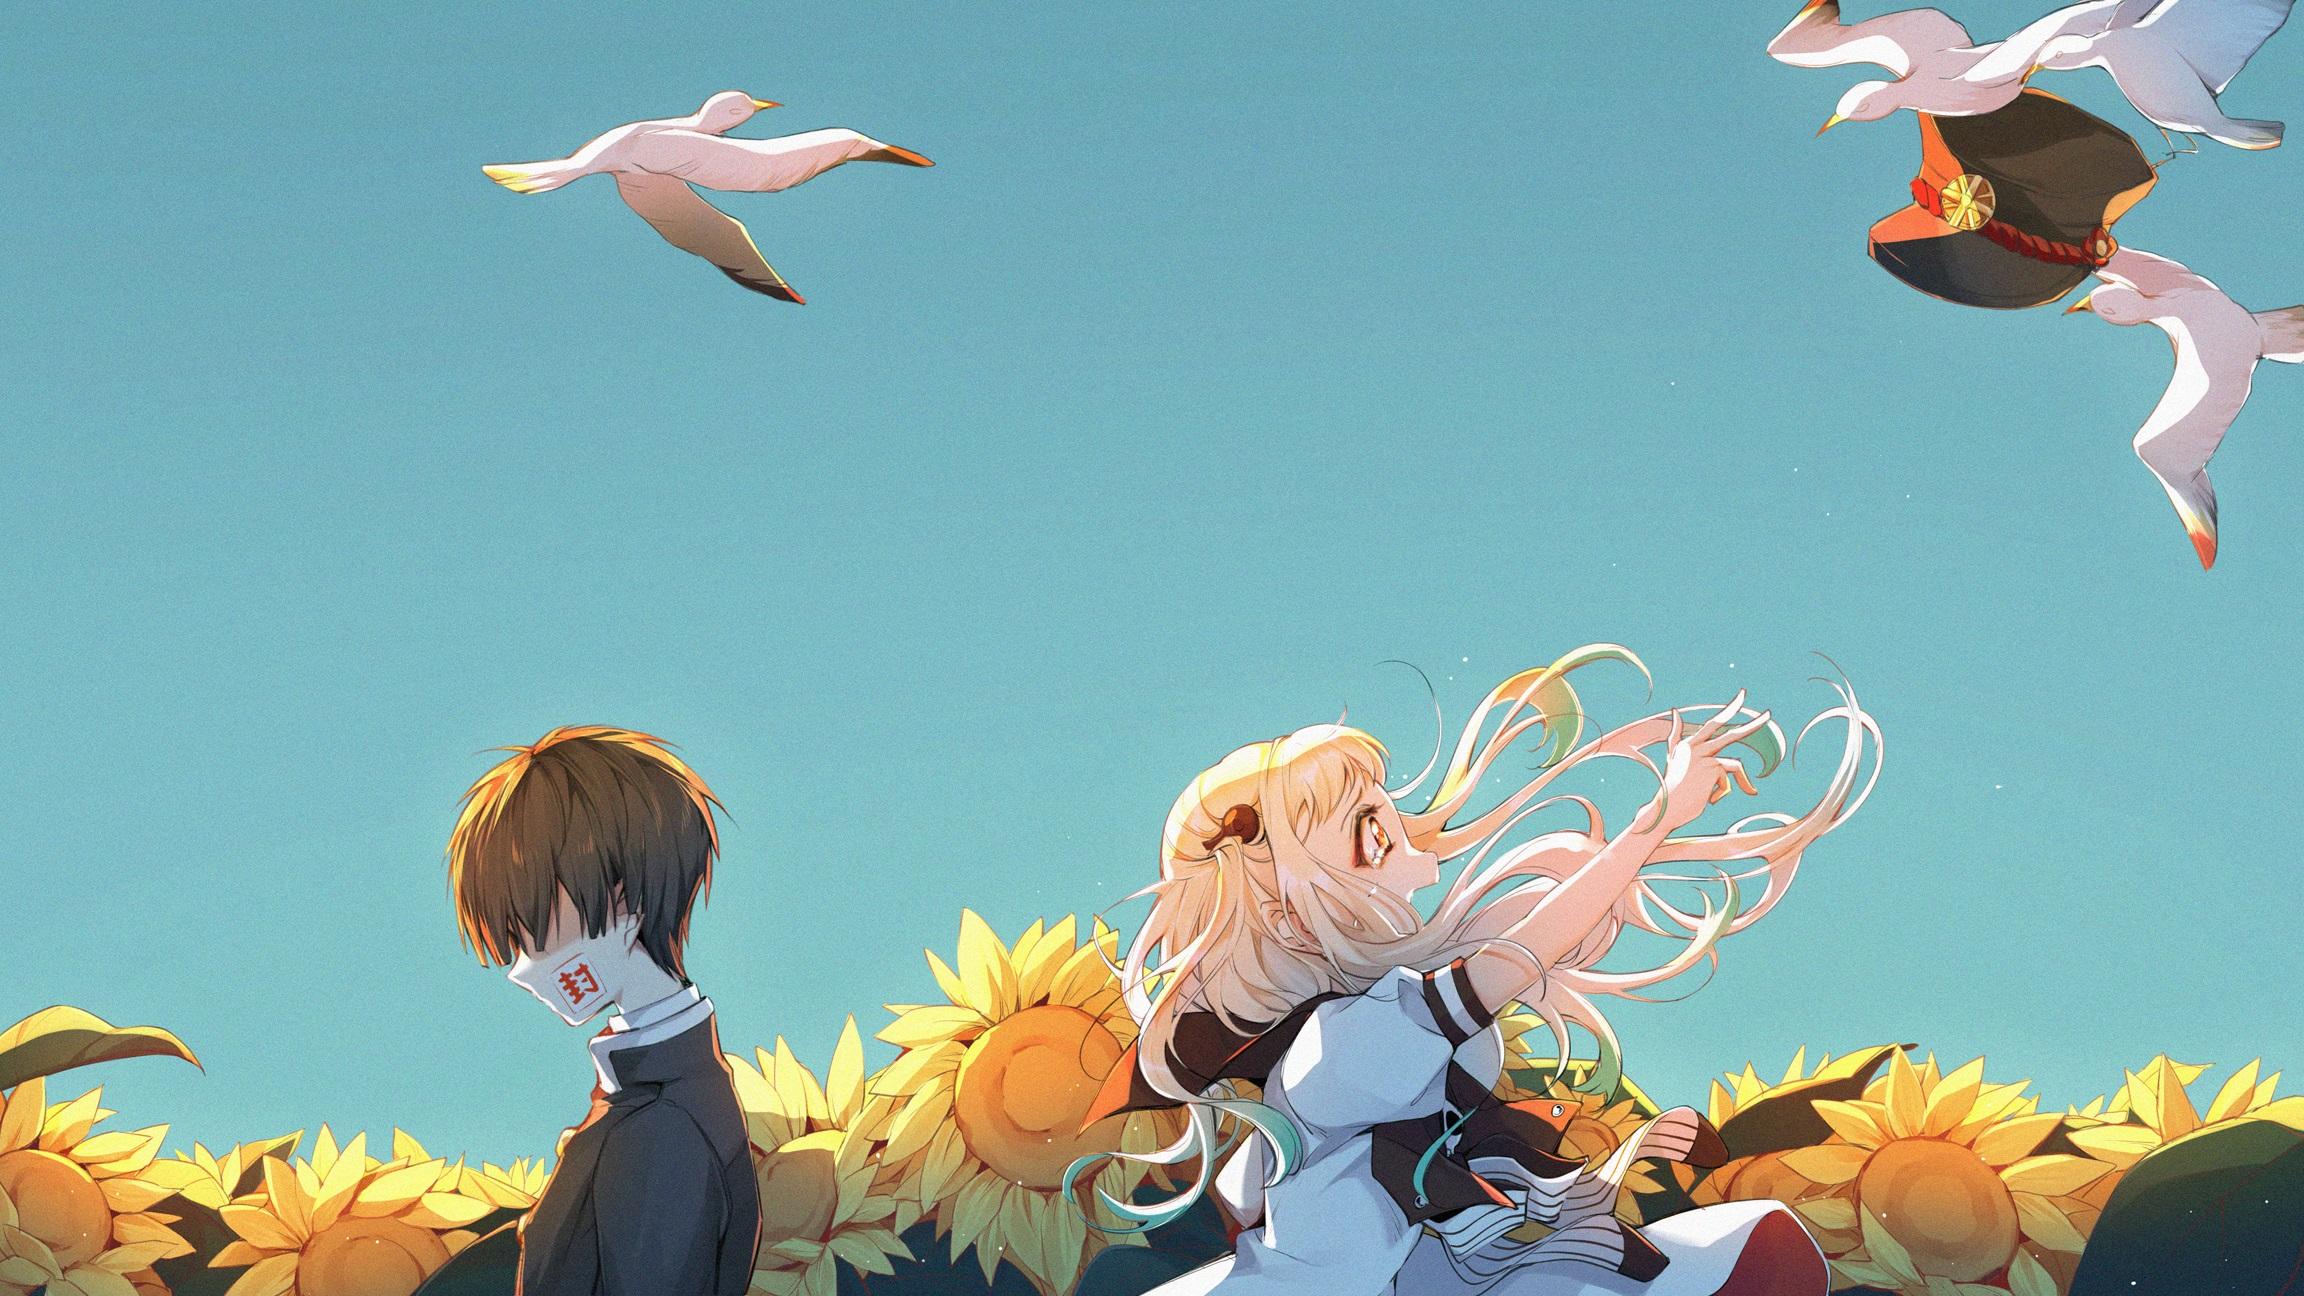 Yashiro nene images yashiro nene (八 (や) 尋 (しろ) 寧 (ね) 々 (ね) , yashiro nene? Jibaku Shounen Hanako-kun HD Wallpaper   Background Image ...